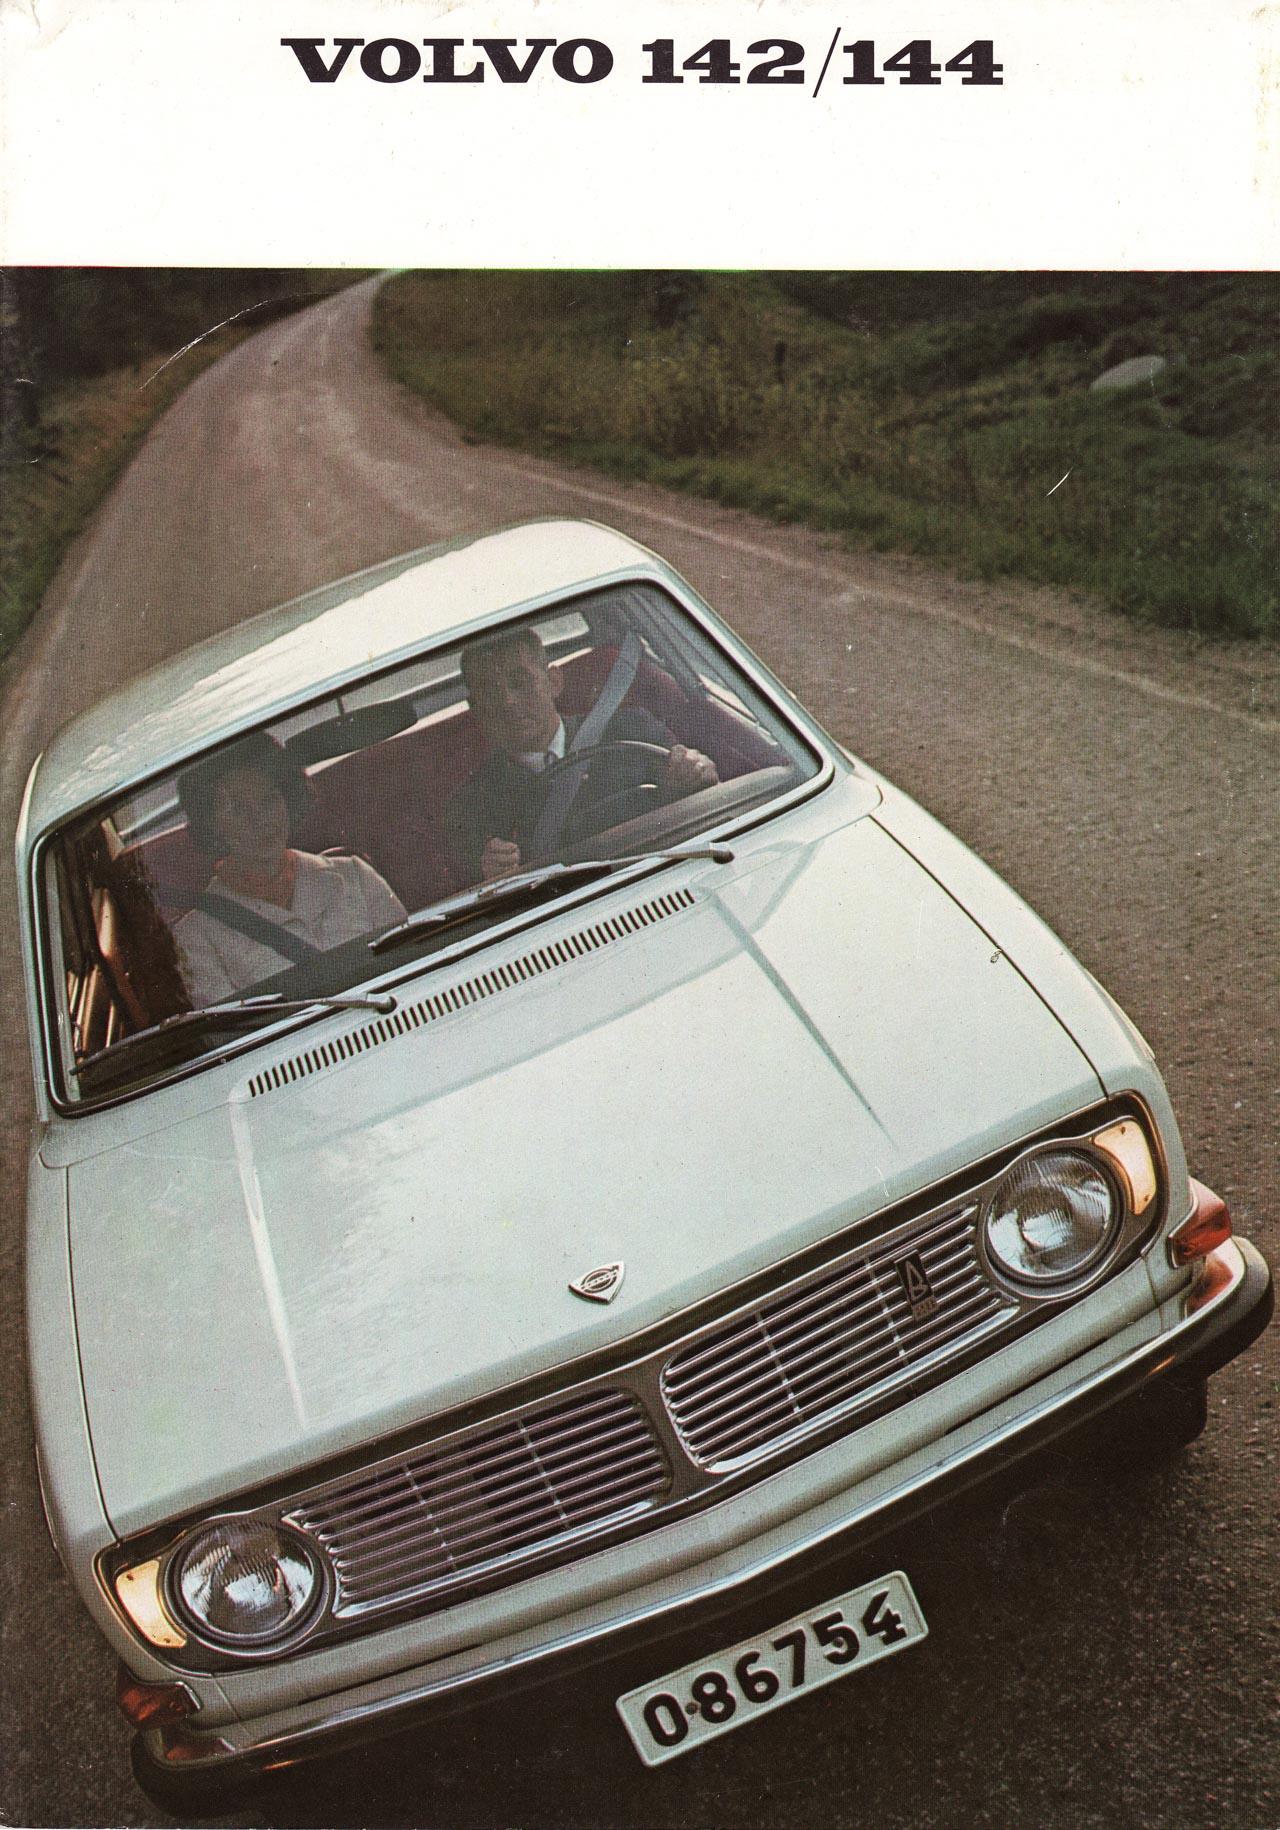 Volvo 142/144